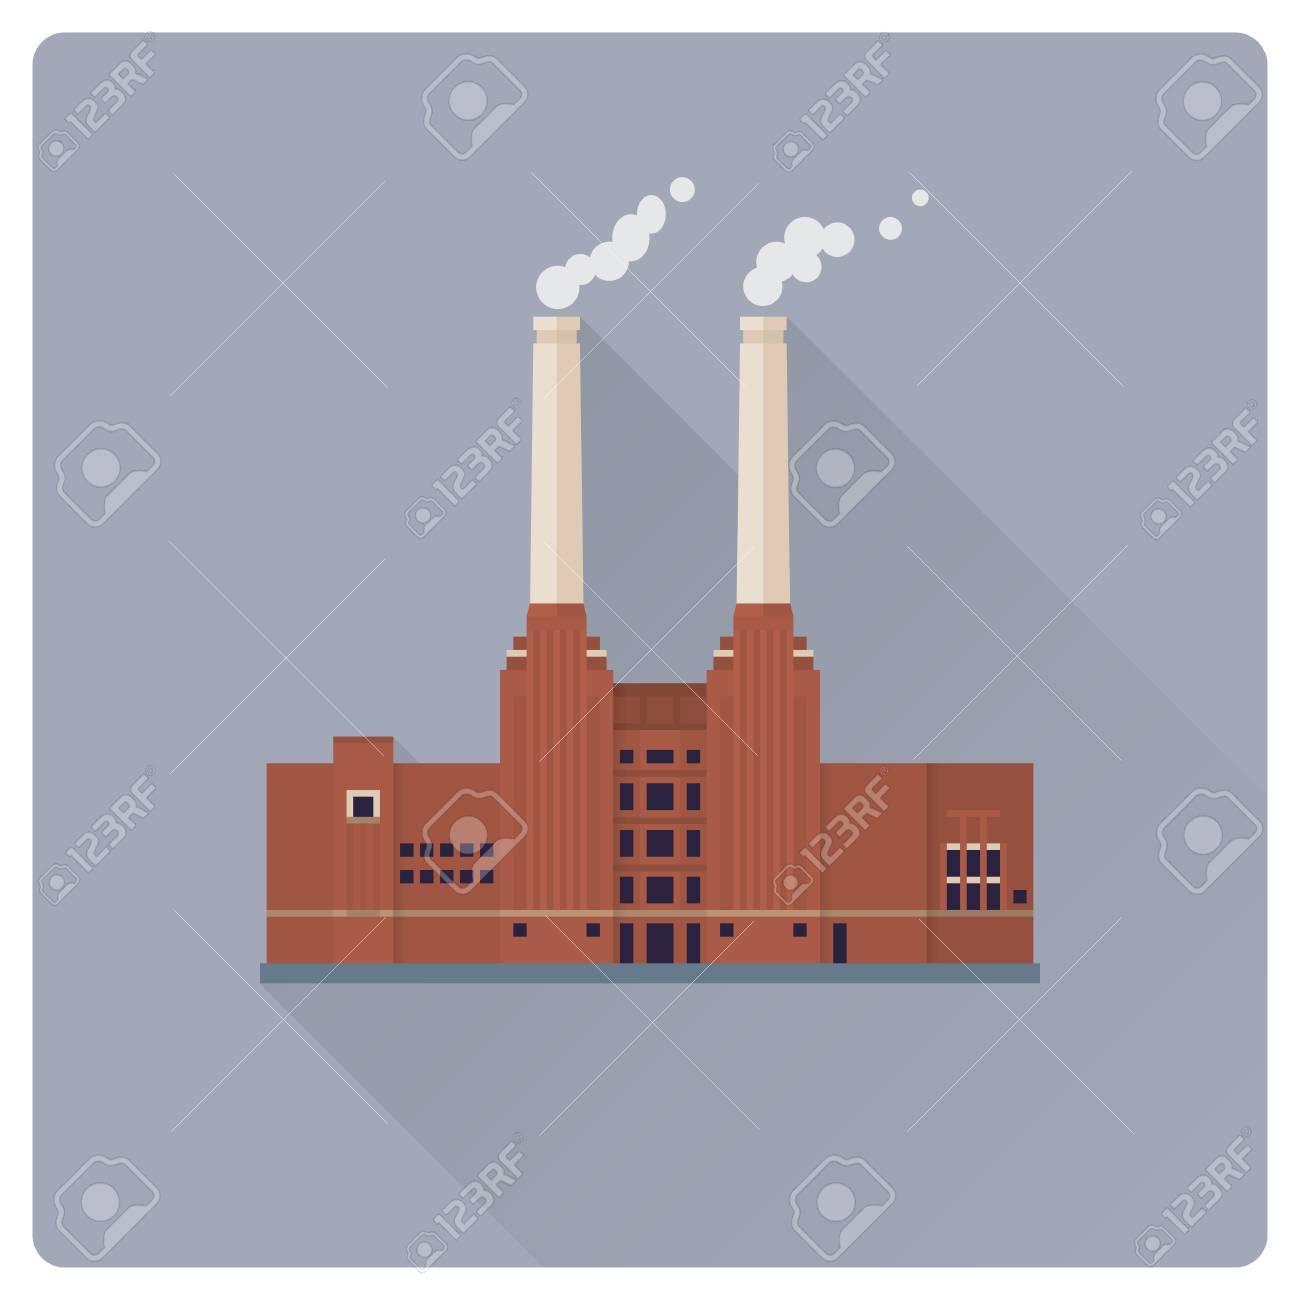 flat design long shadow coal power plant building vector illustration